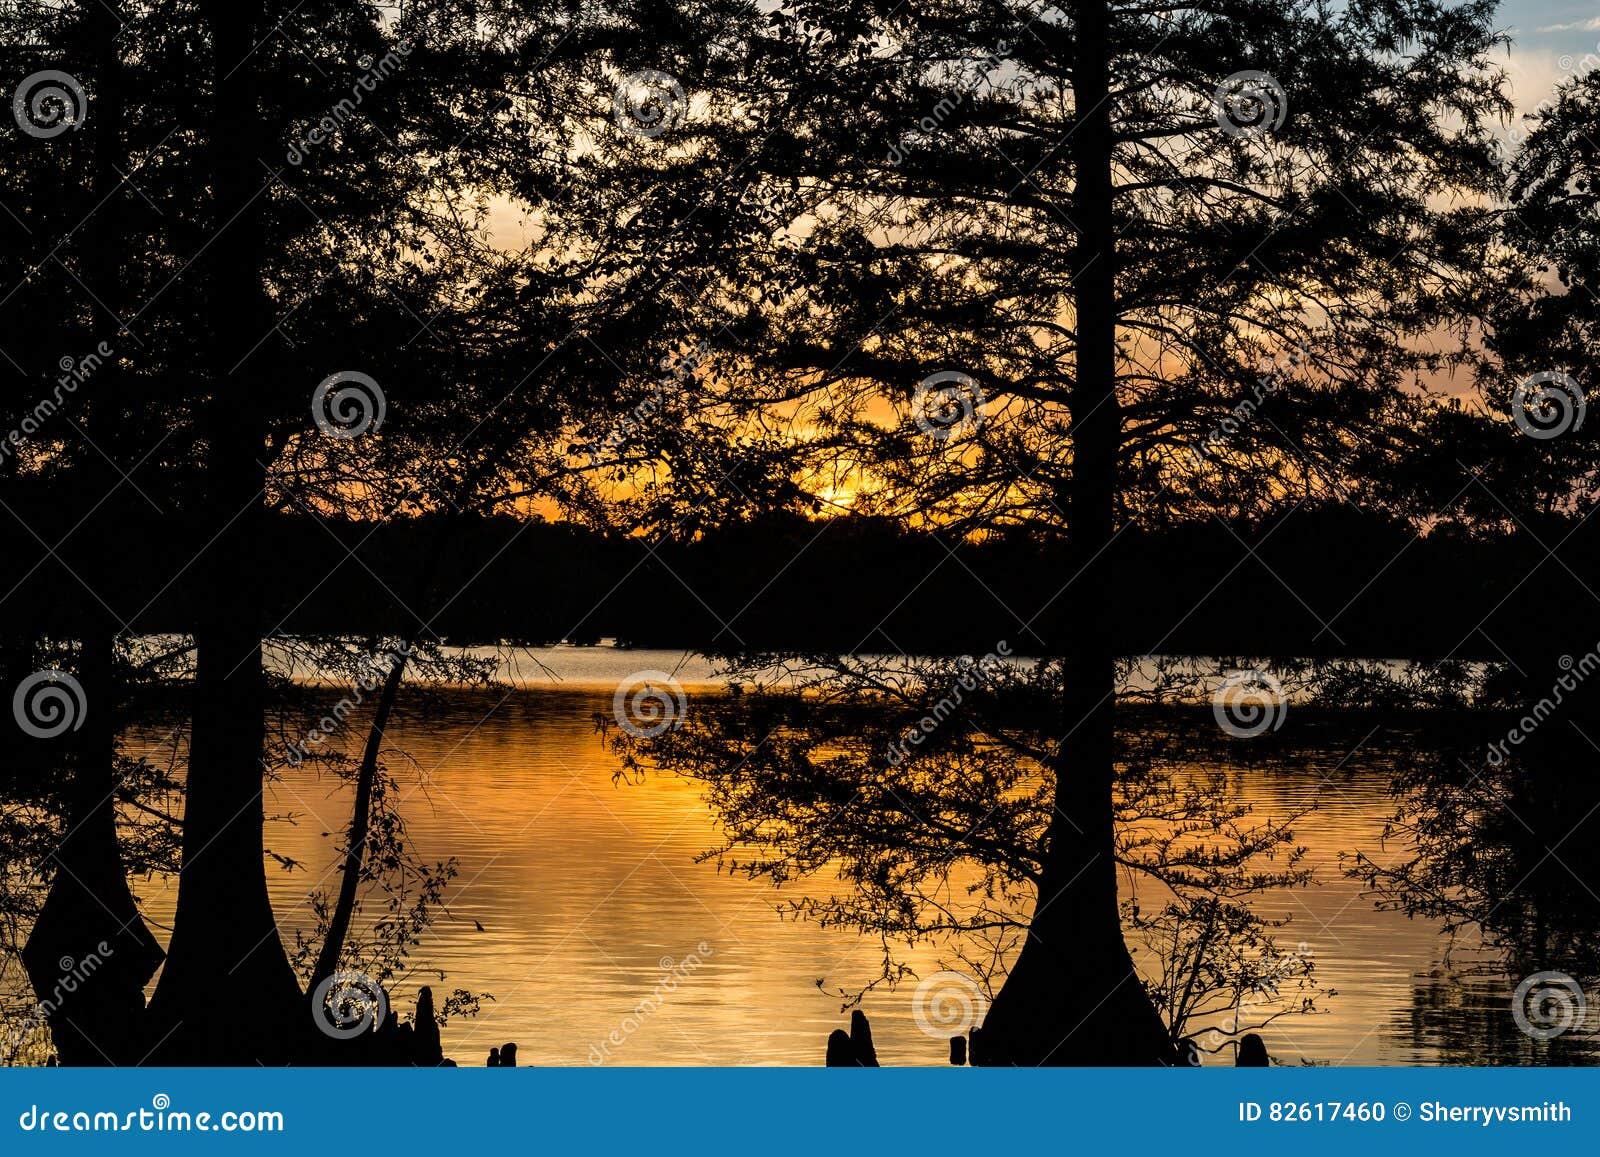 Sunset Through Bald Cypress Trees in Virginia Beach, Virginia